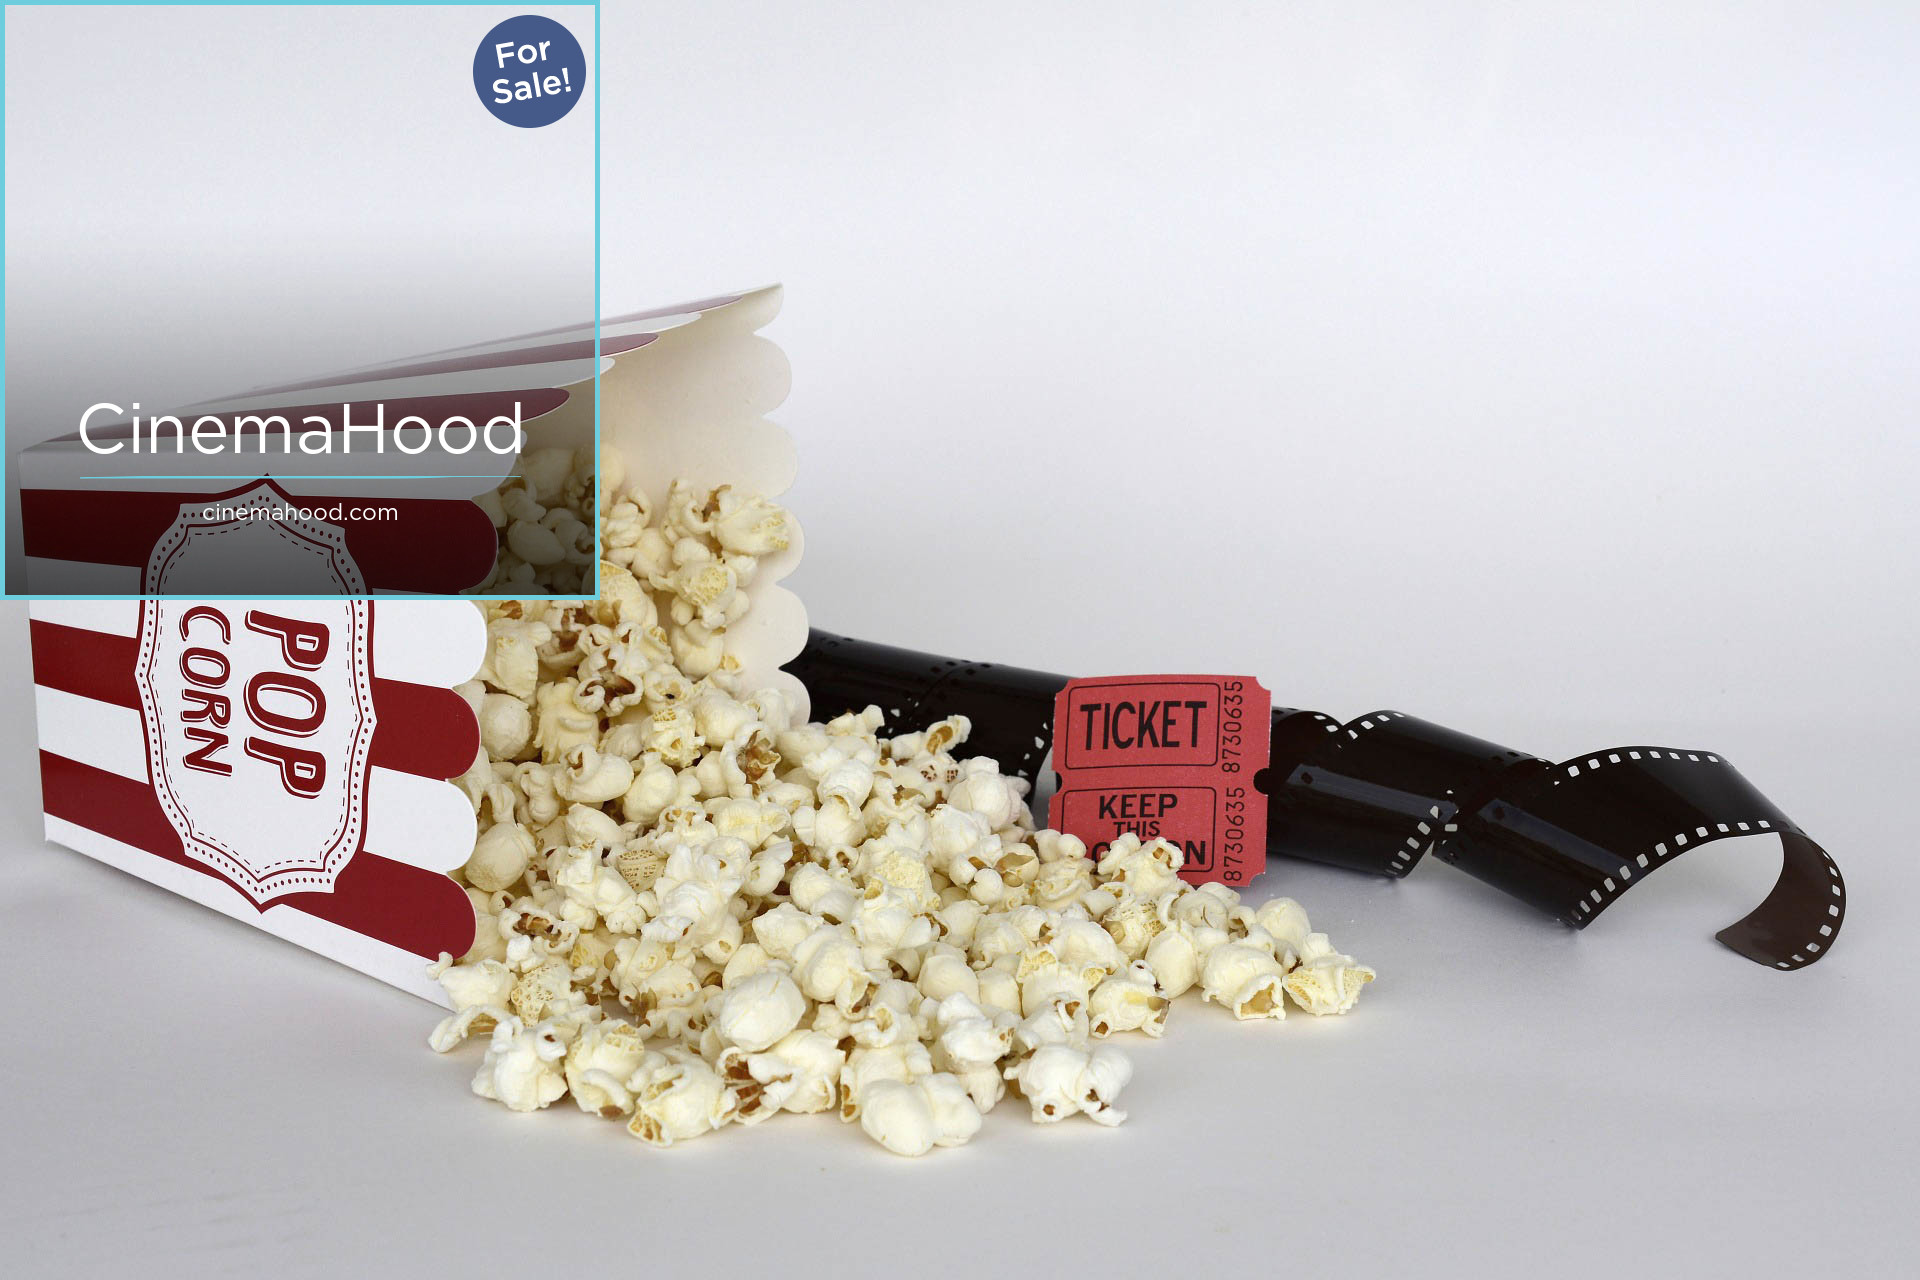 CinemaHood.com